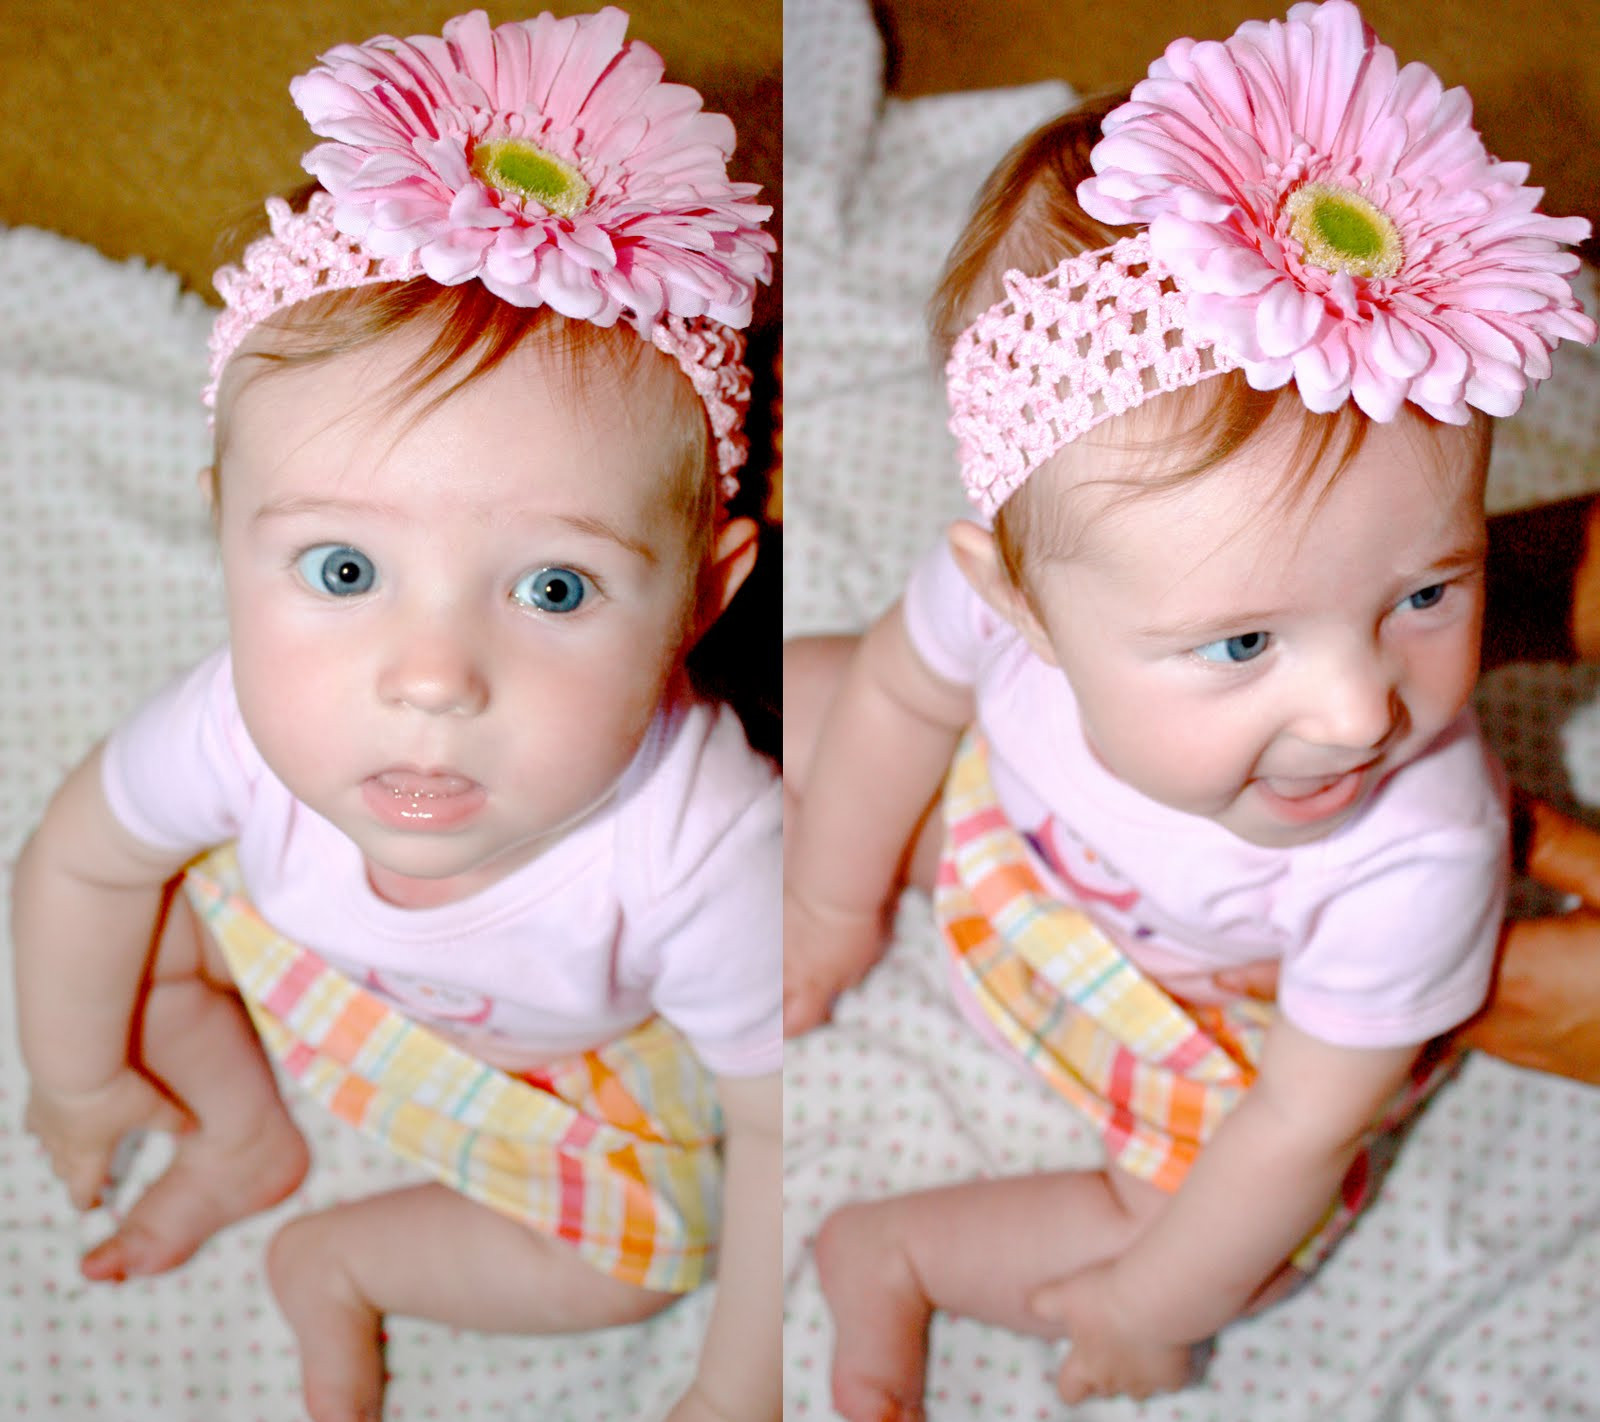 DIY Baby Headbands  DIY Baby Flower Headbands Wild Oak Stream